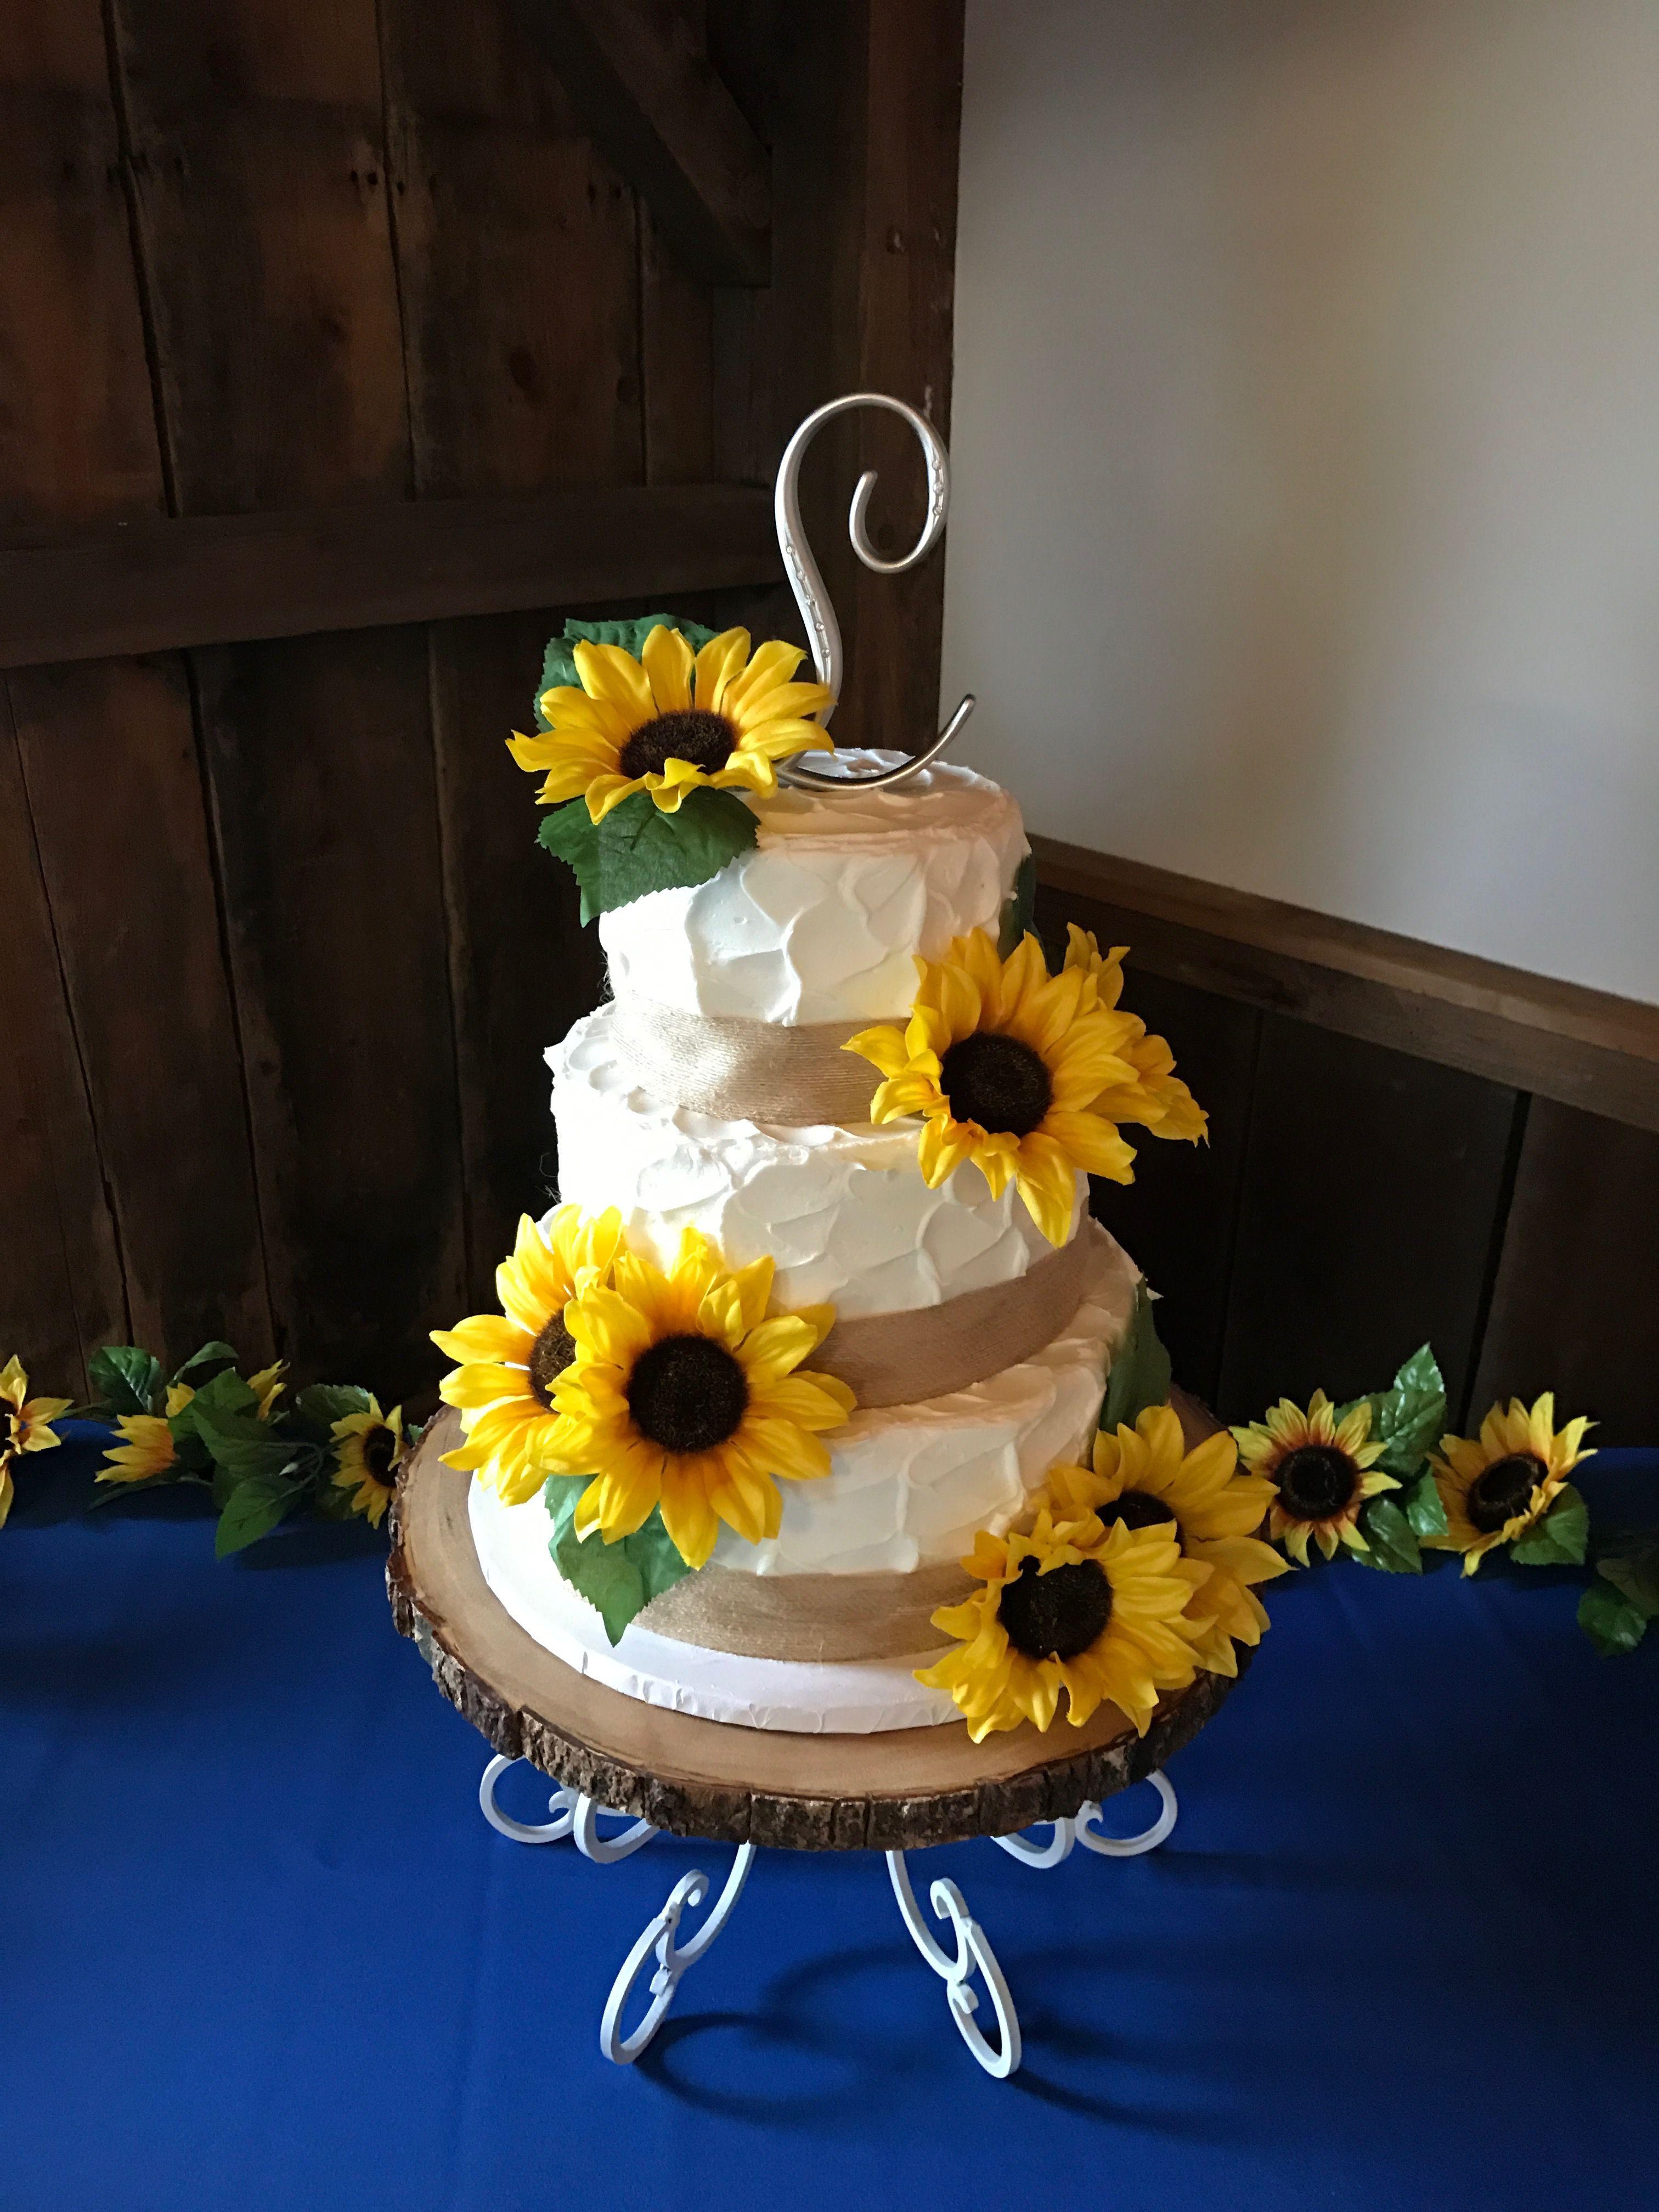 Sunflower cake Sunflower cakes, Table decorations